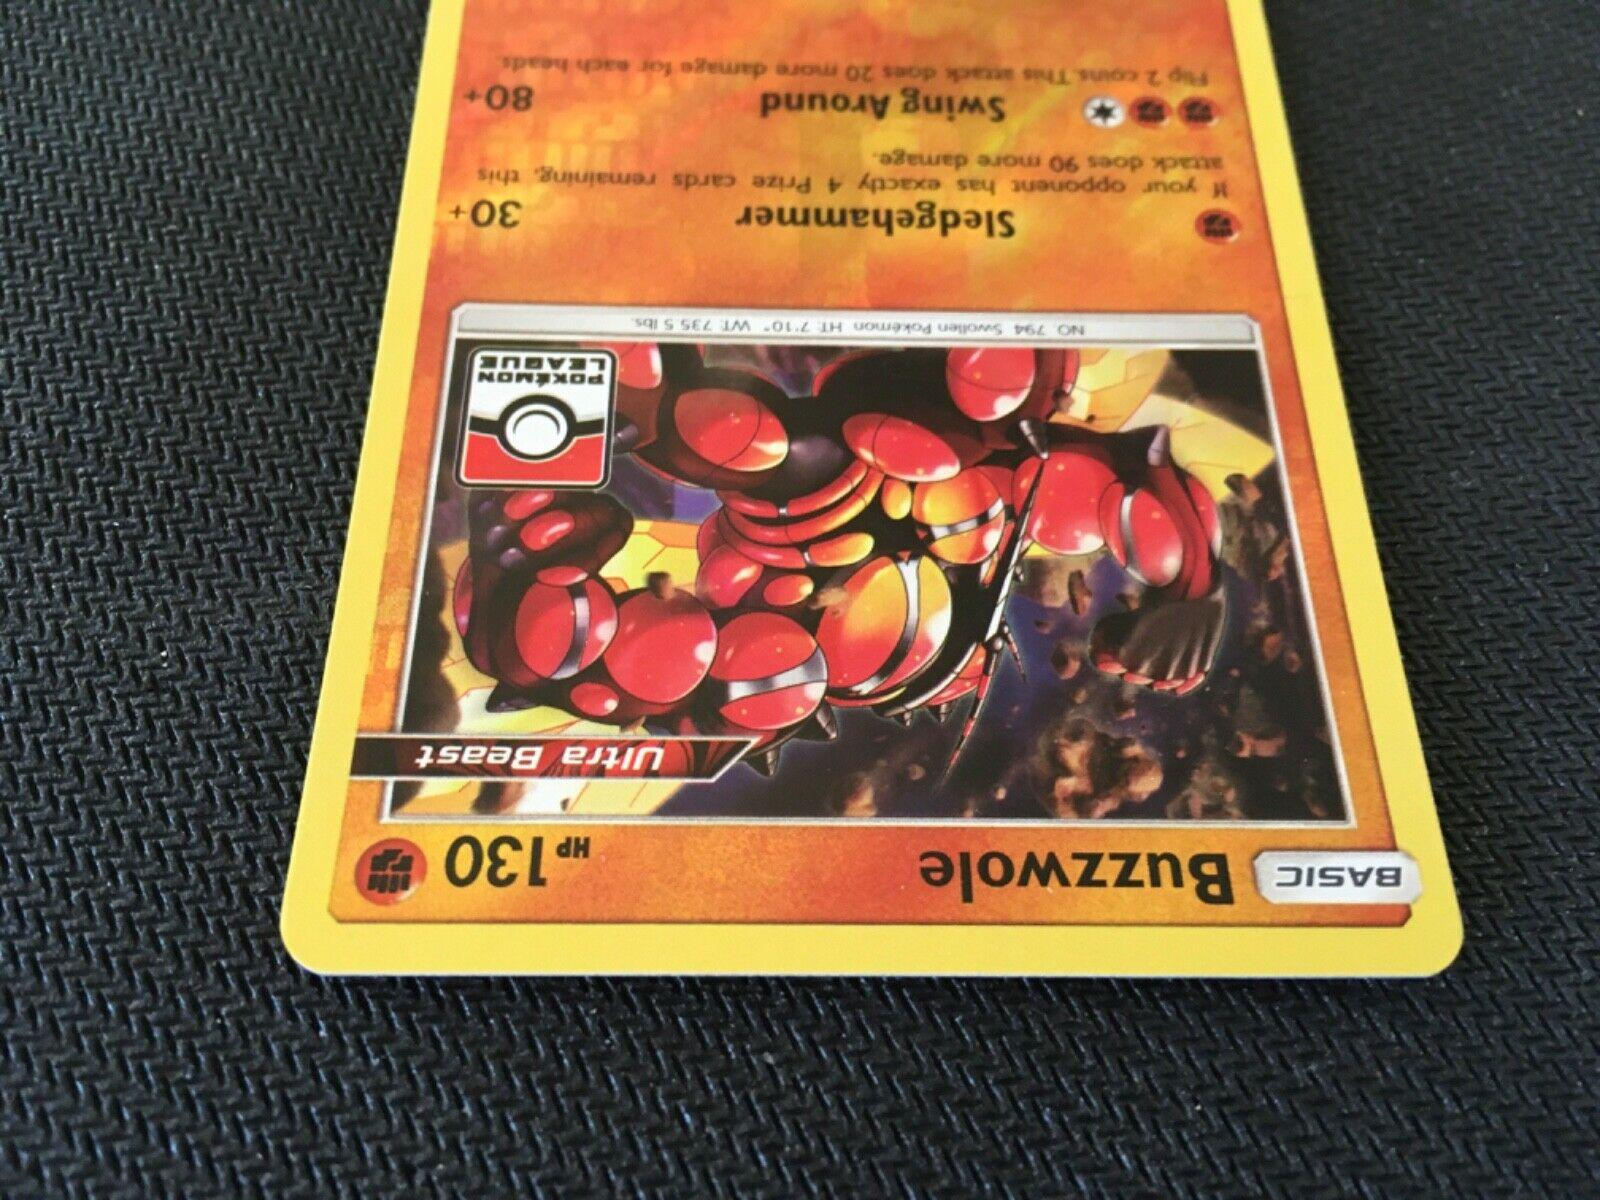 Buzzwole Rare Holo League Promo Pokemon Card Trainer Item Forbidden Light 77/131 - Image 5